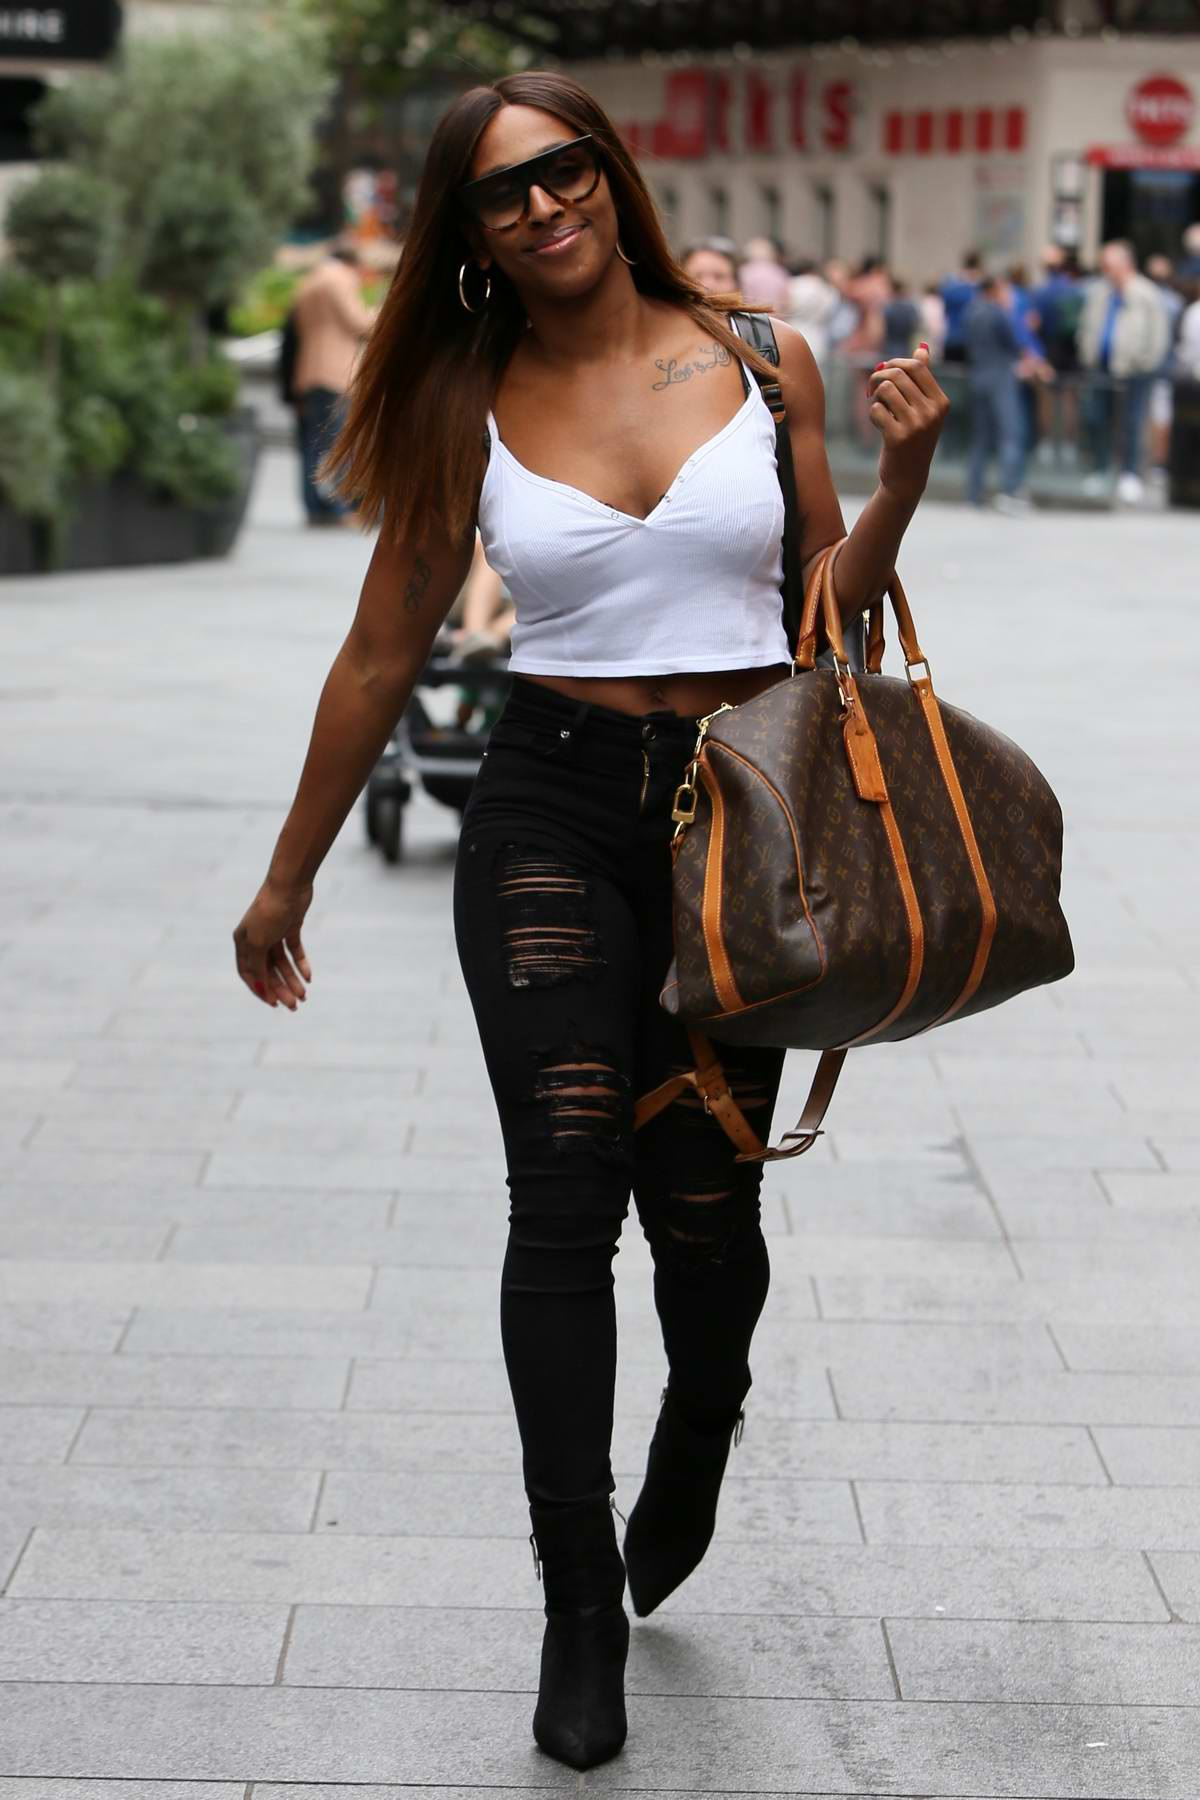 Alexandra Burke seen wearing a white top and black skinny jeans as she leaves Global Studios in London, UK